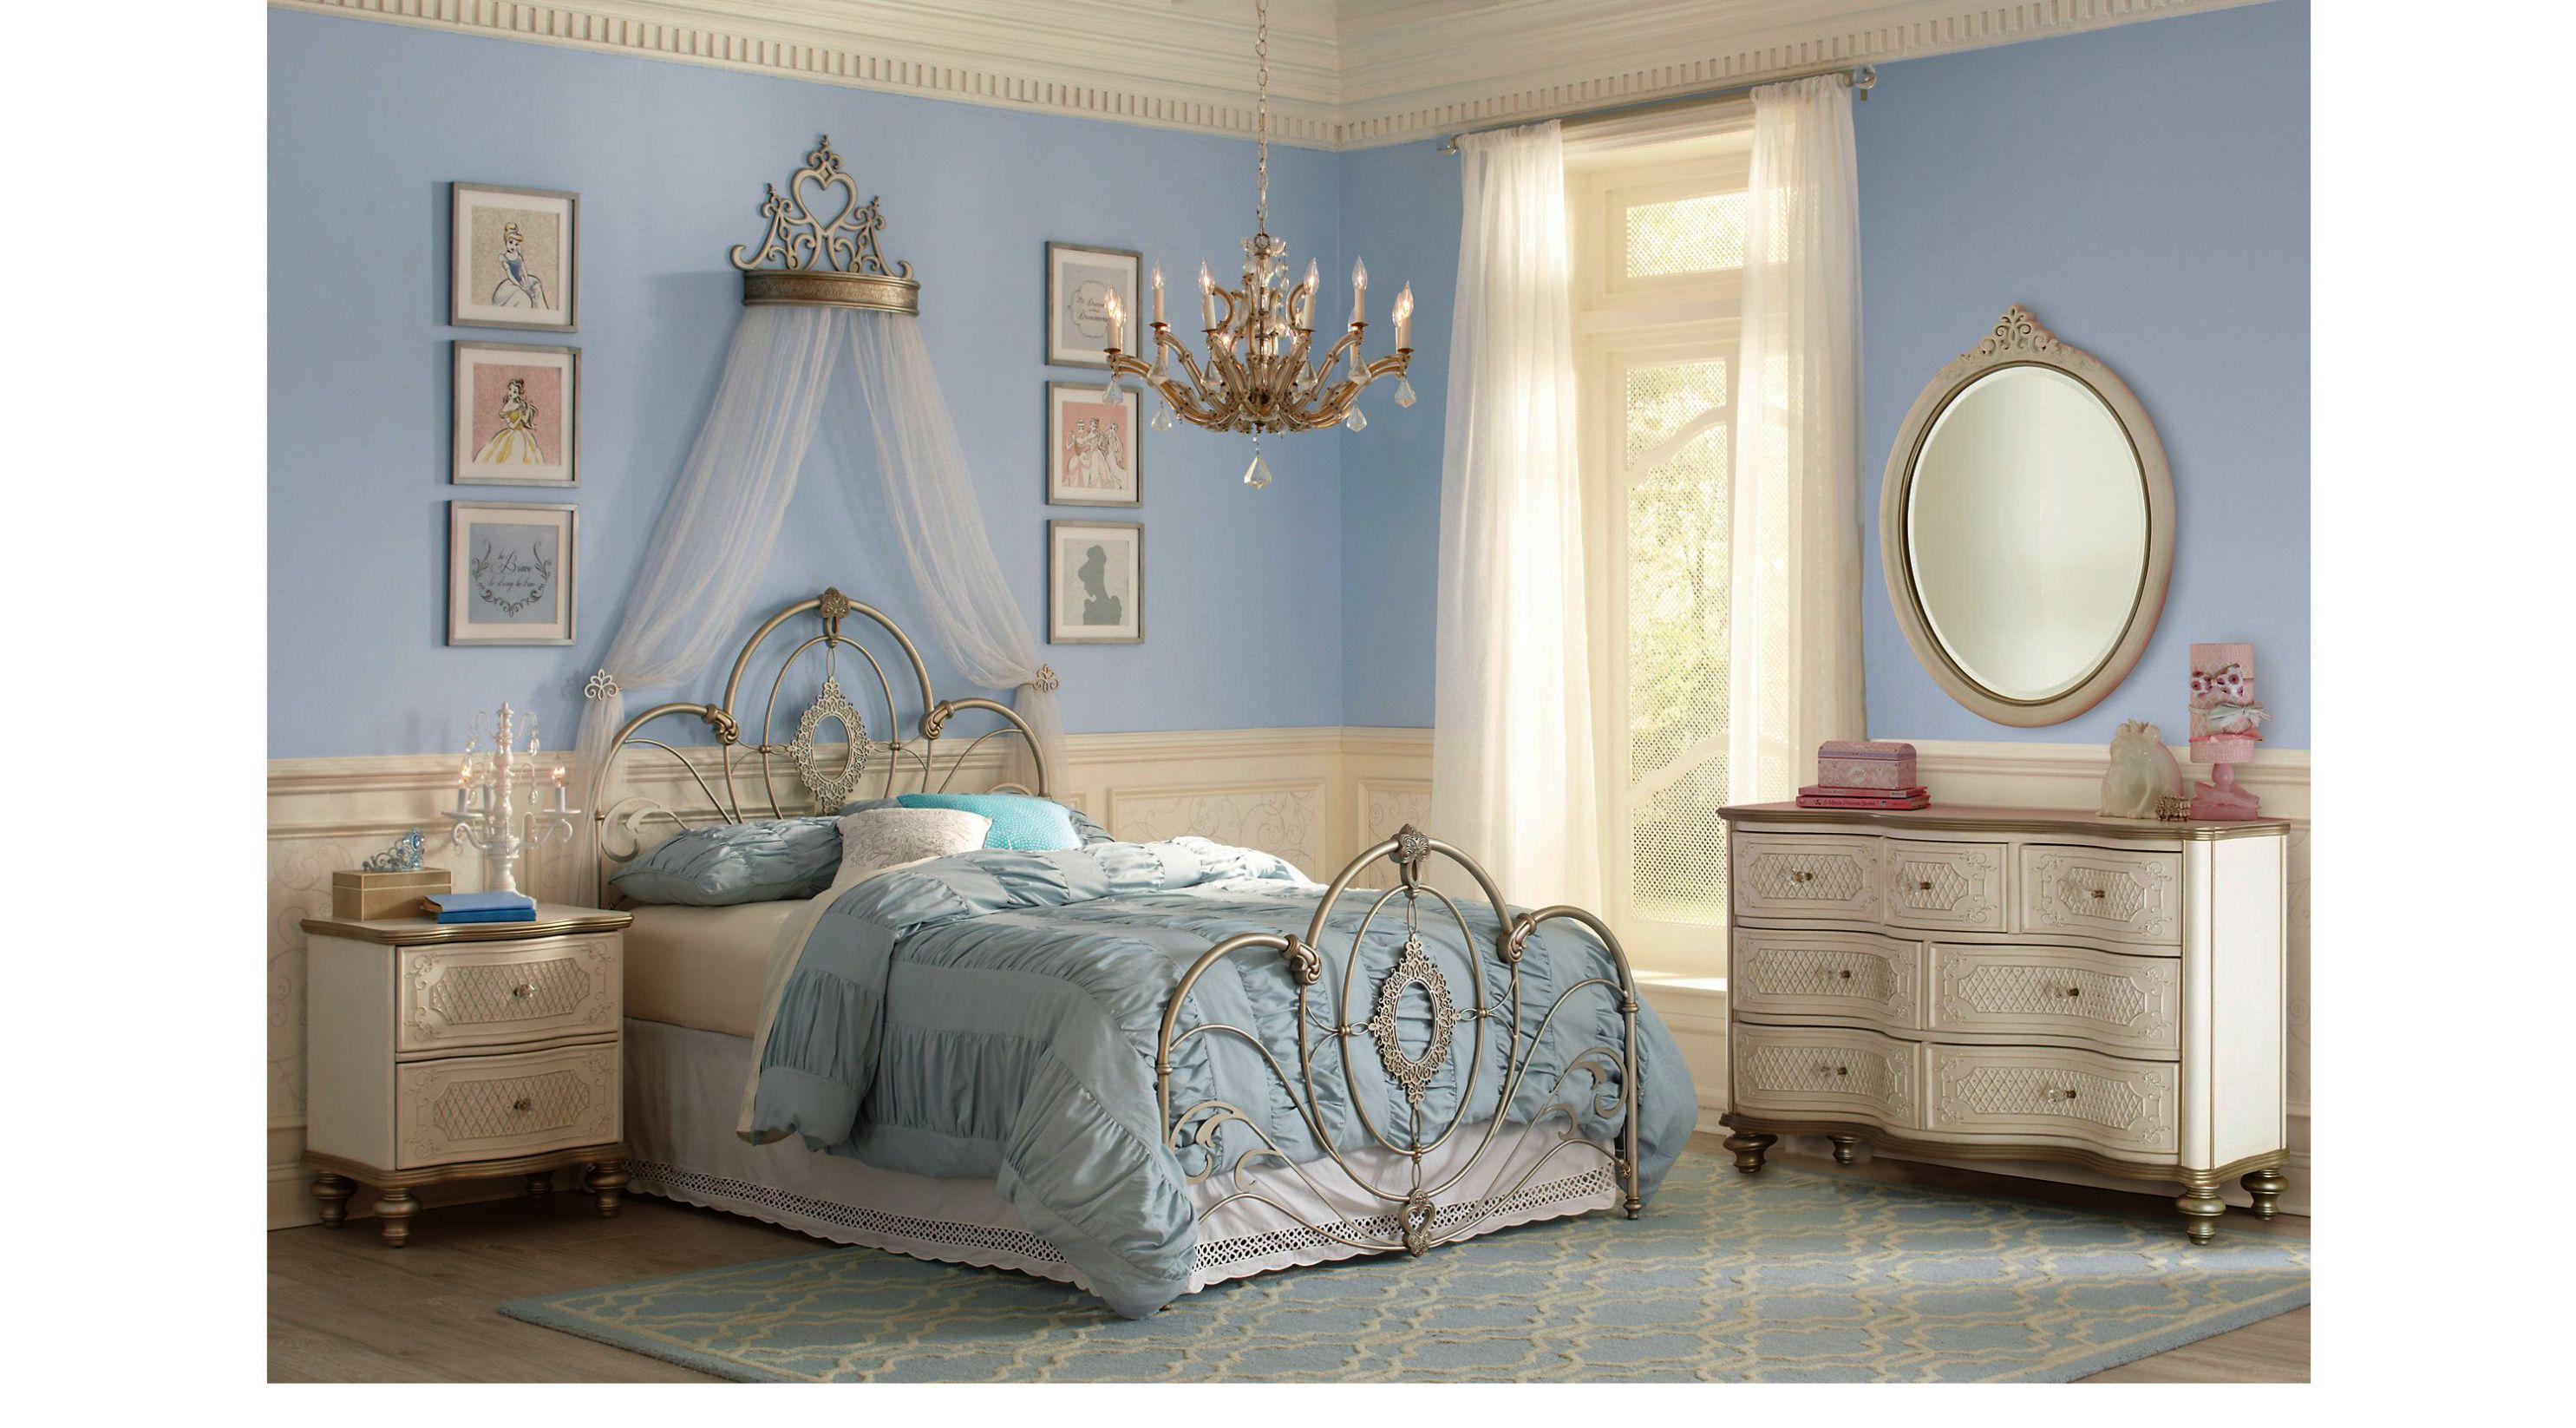 Furniture Design For Children S Bedrooms So Habit Furniture Bedroom Set Price Bedroom Furniture Layout Cheap Bedroom Furniture Bedroom Furniture